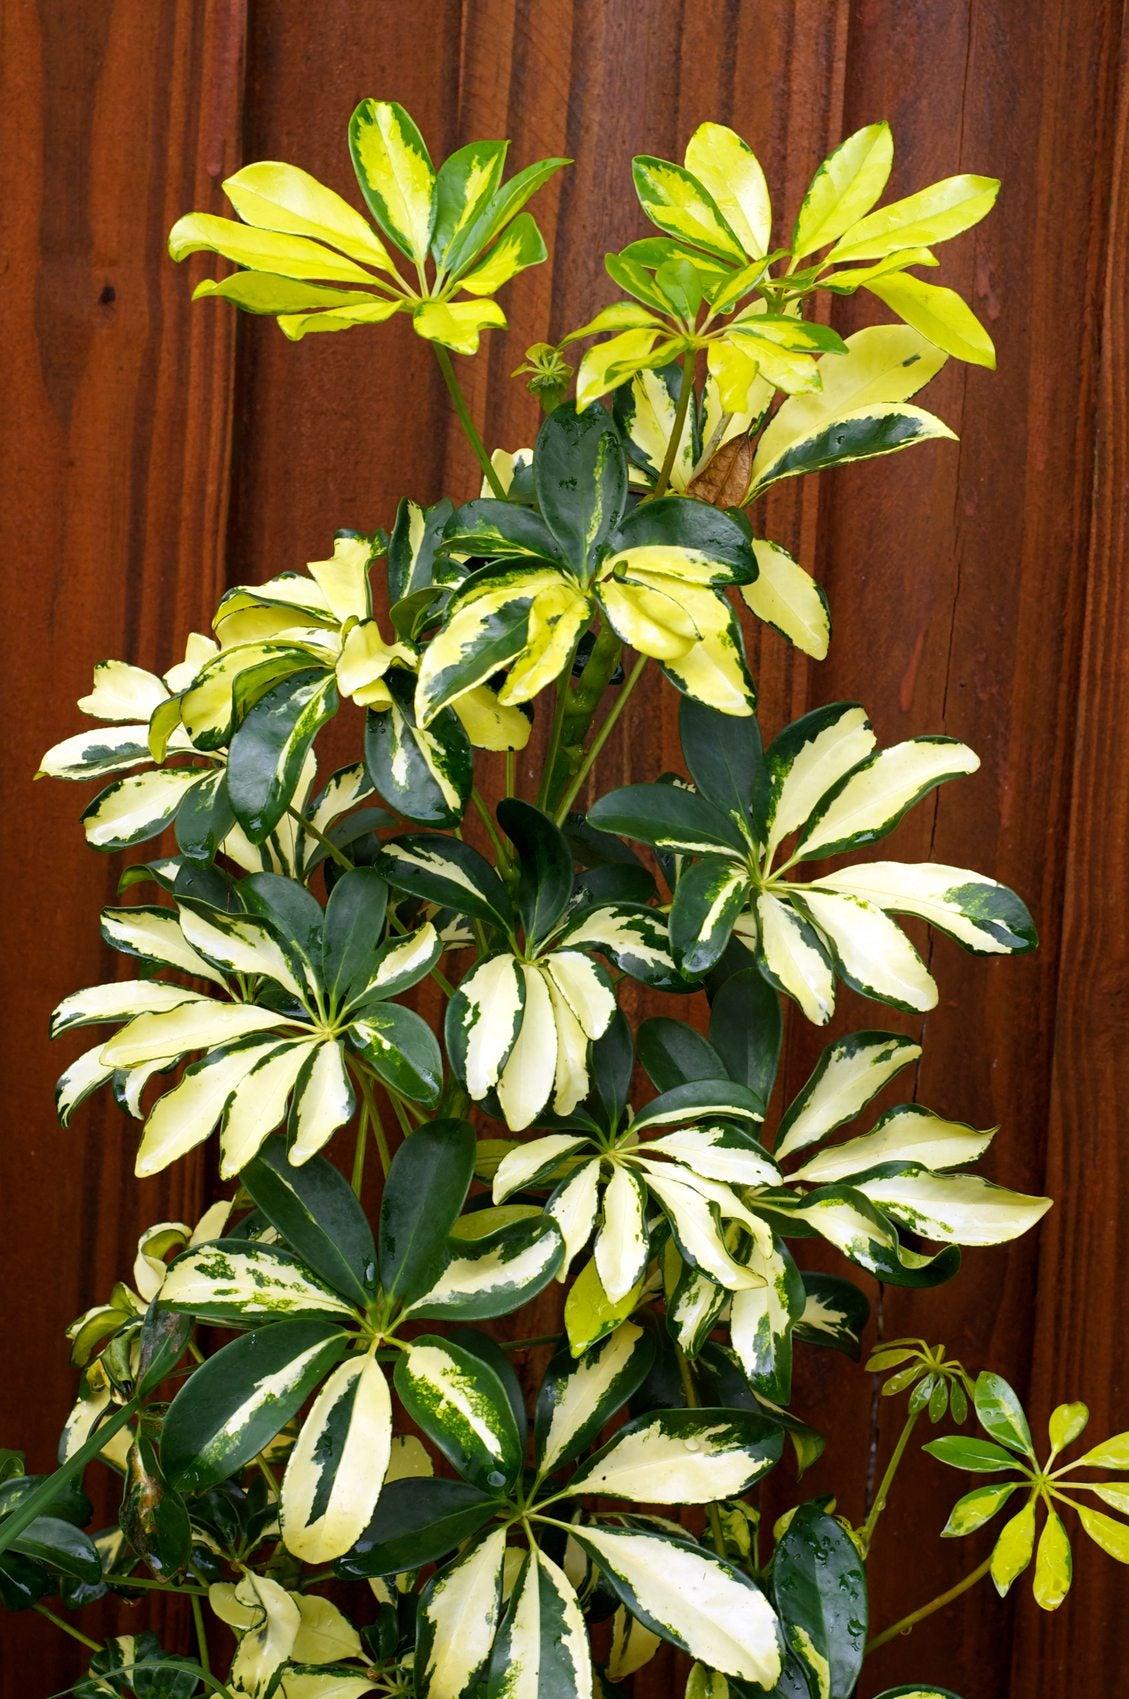 Providing Tree And Plant Care: Trimming Schefflera Houseplants